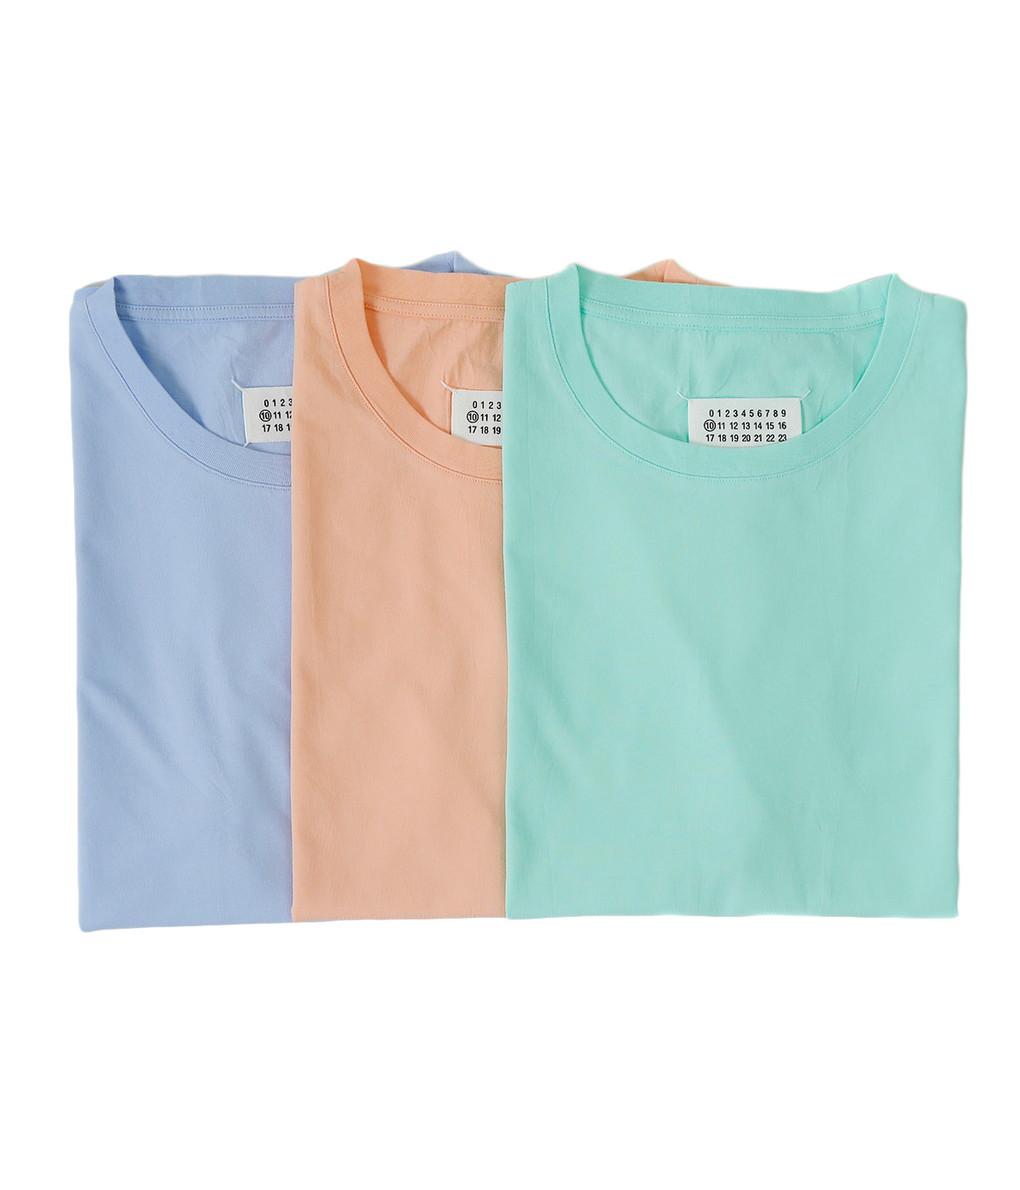 Maison Margiela / メゾン マルジェラ : PACK TEE-MULTI- : パック Tシャツ 半袖 : S50GC0540-MULTI-bjb 【BJB】